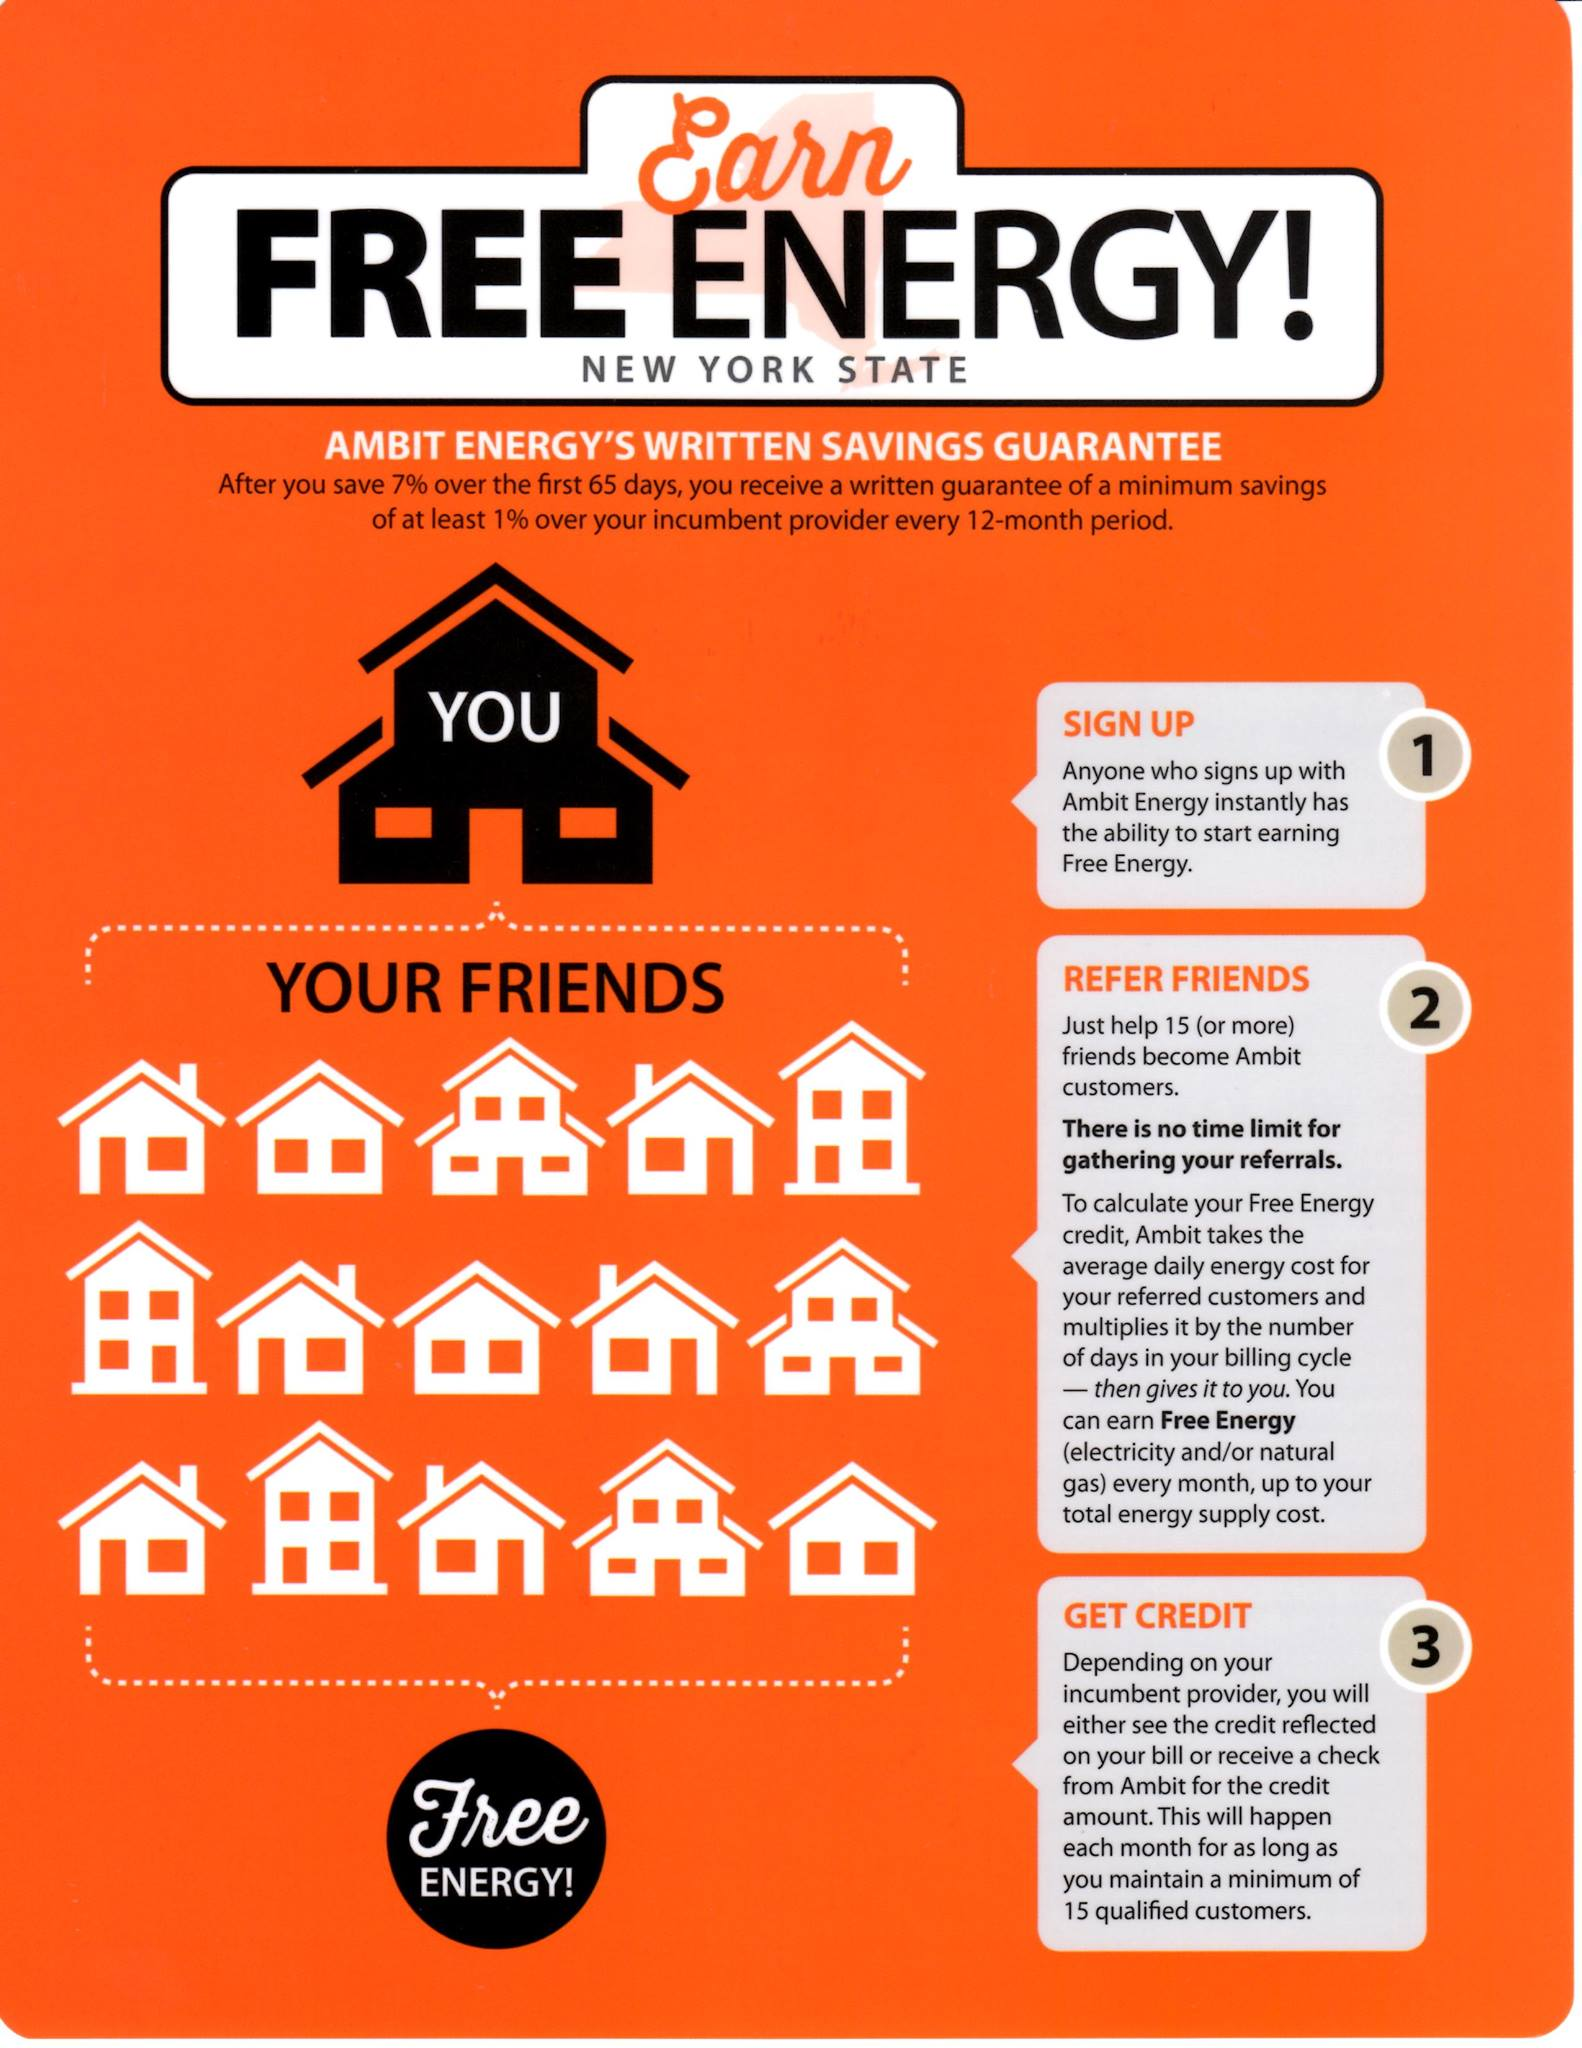 Ambit Energy >> Ambit Energy Quotes. QuotesGram